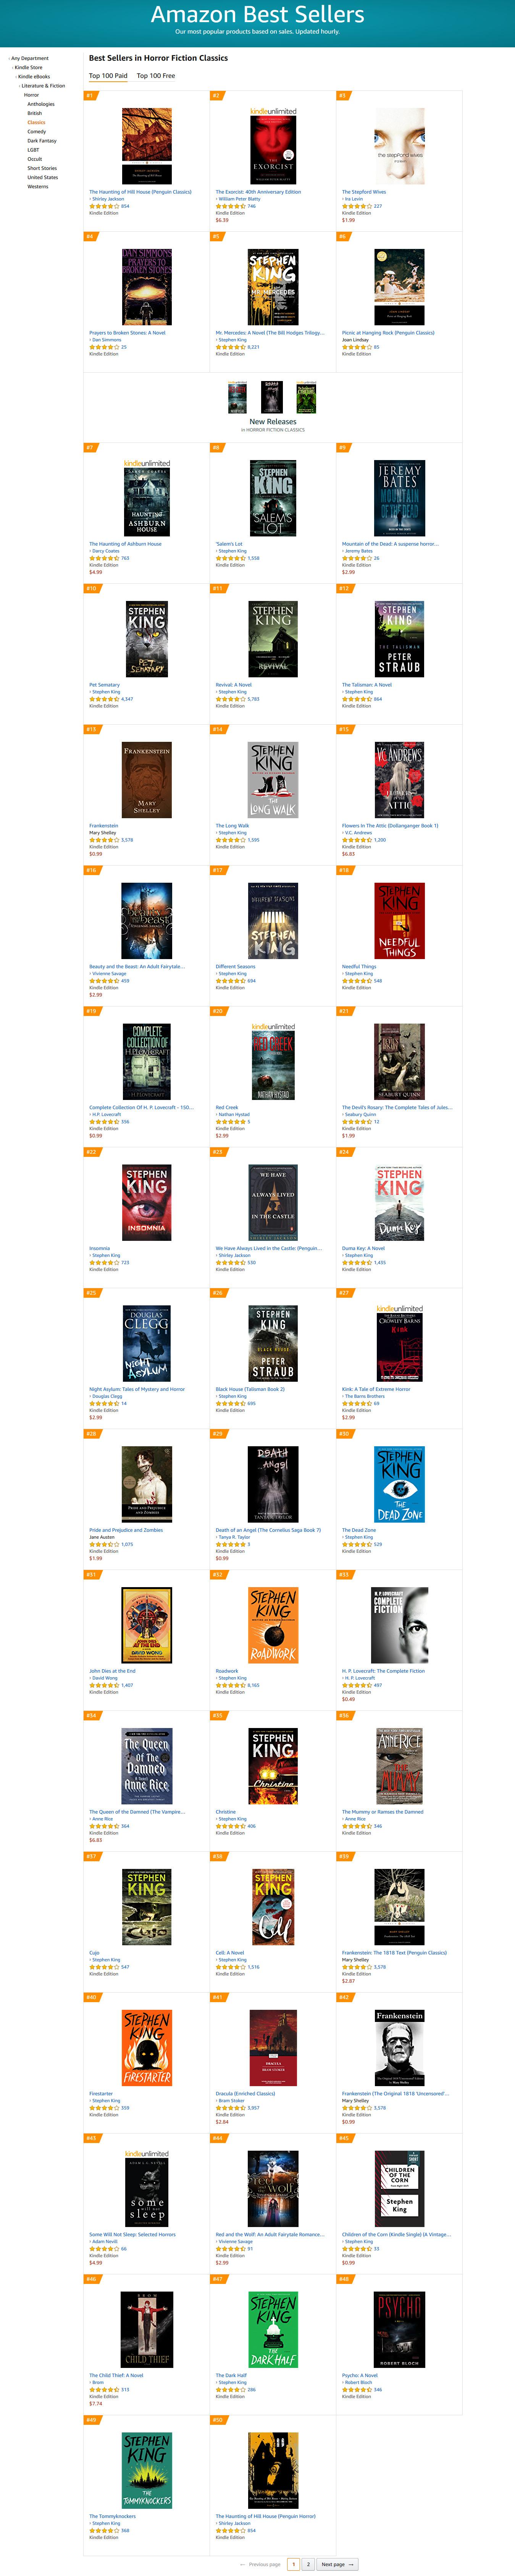 Screenshot-2018-6-6 Amazon Best Sellers Best Horror Fiction Classics